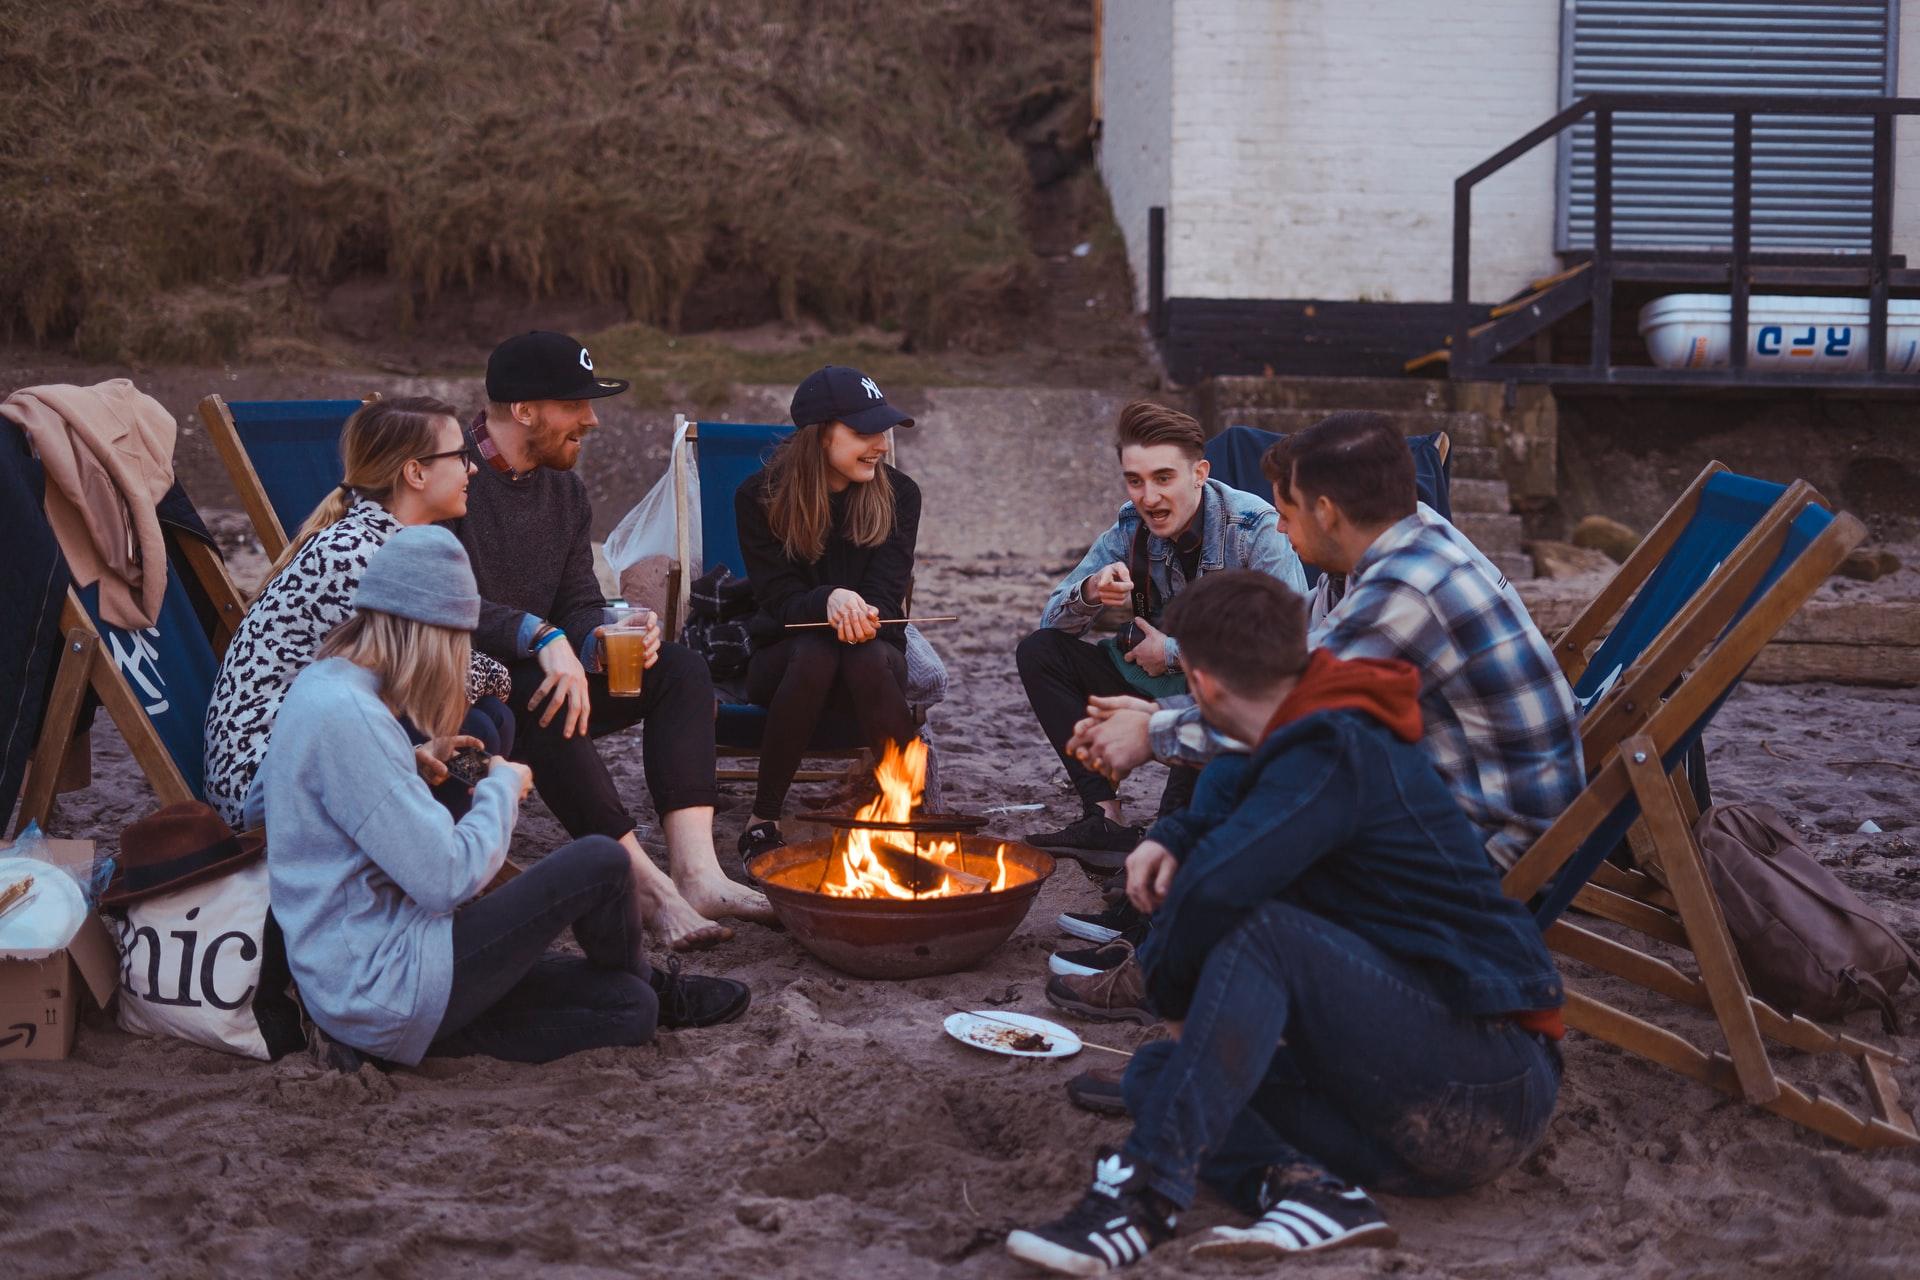 5 Ways to Target Millennials Through Content Marketing